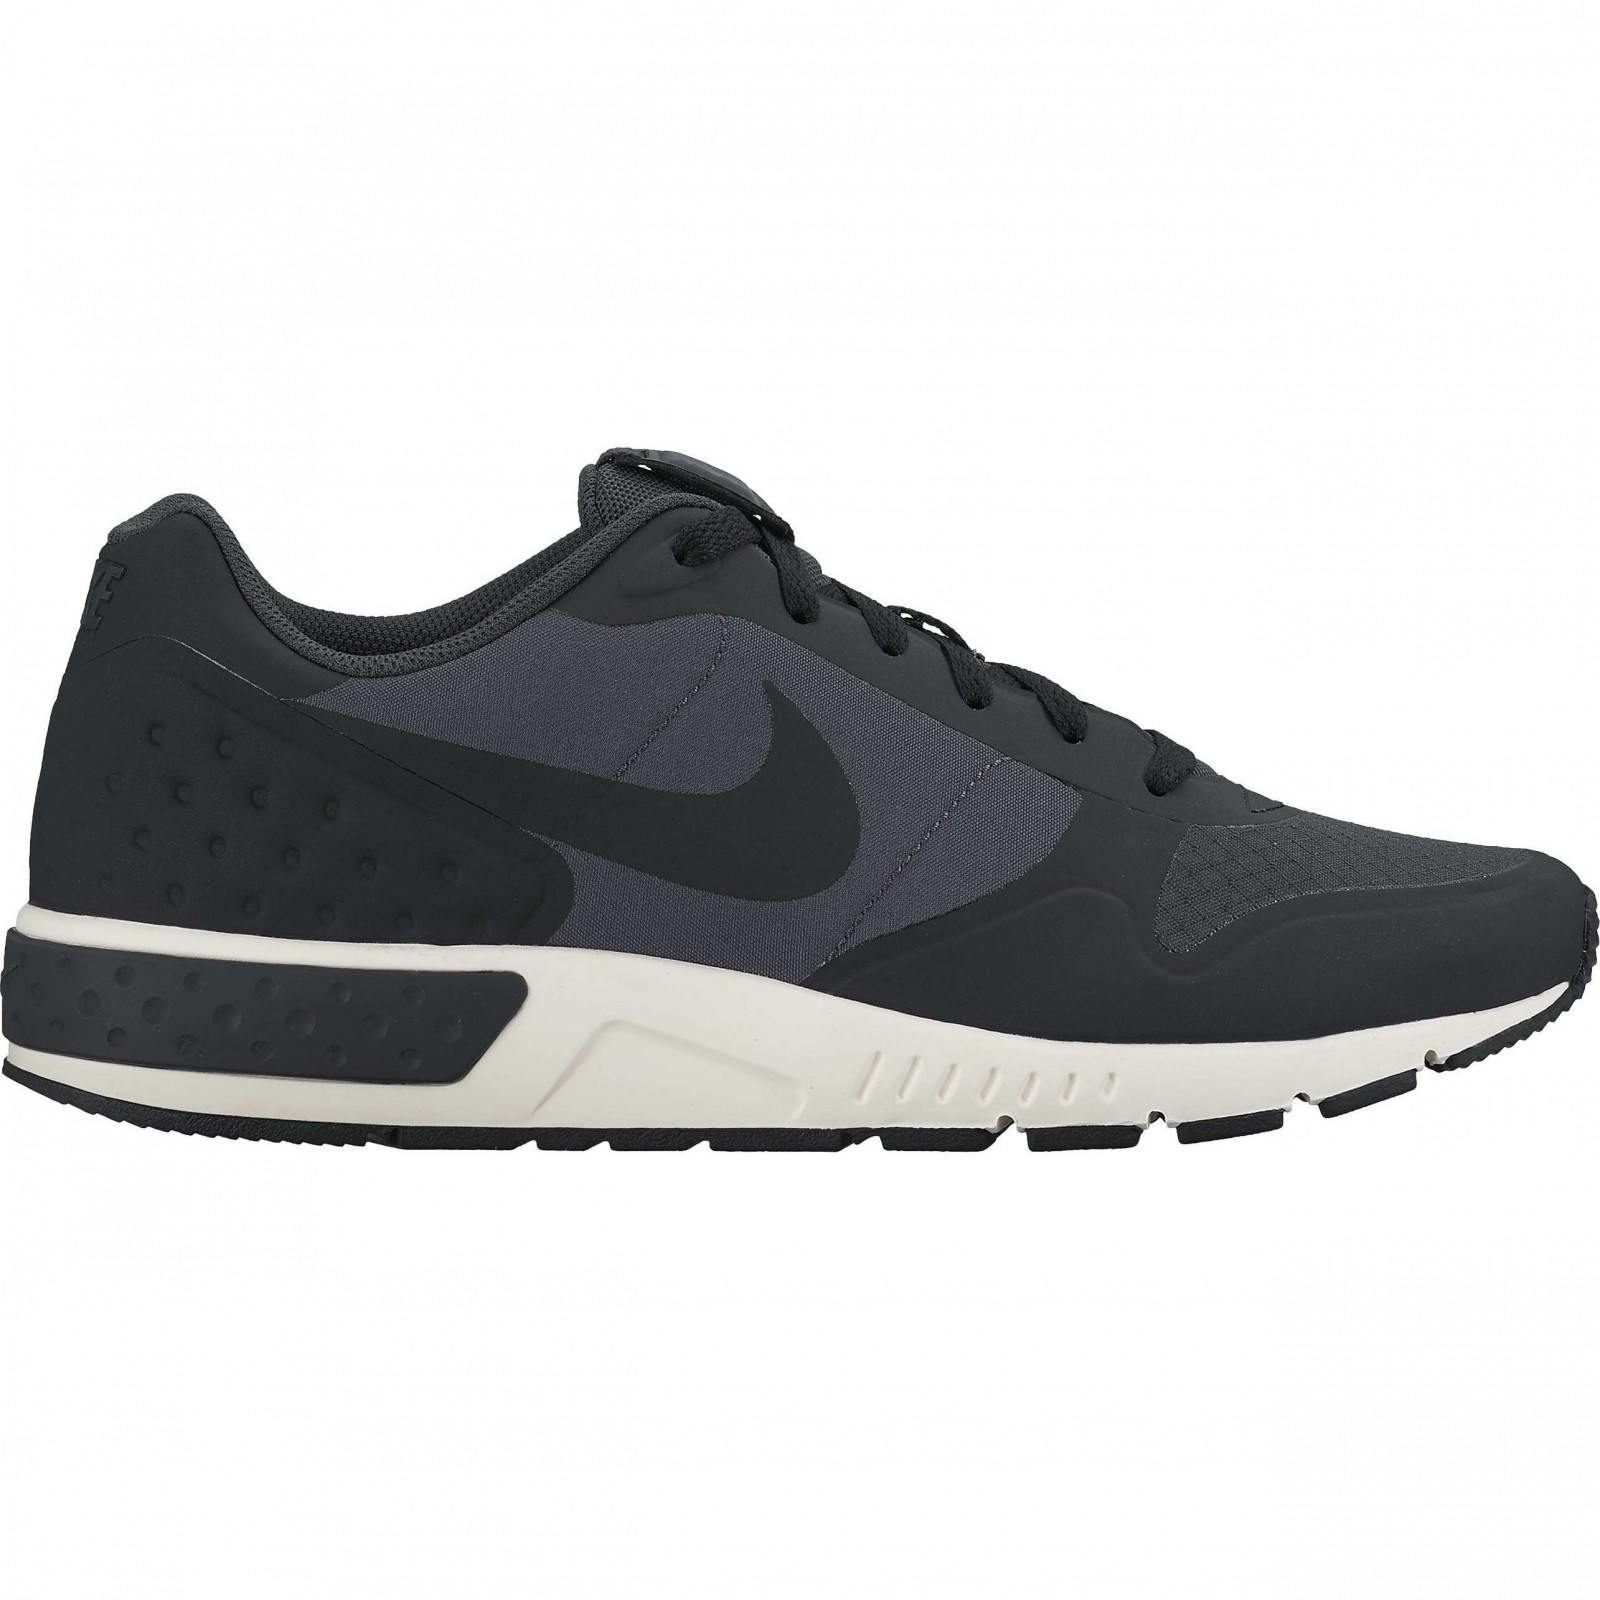 Pánské tenisky Nike NIGHTGAZER LW  89e231a7a5e